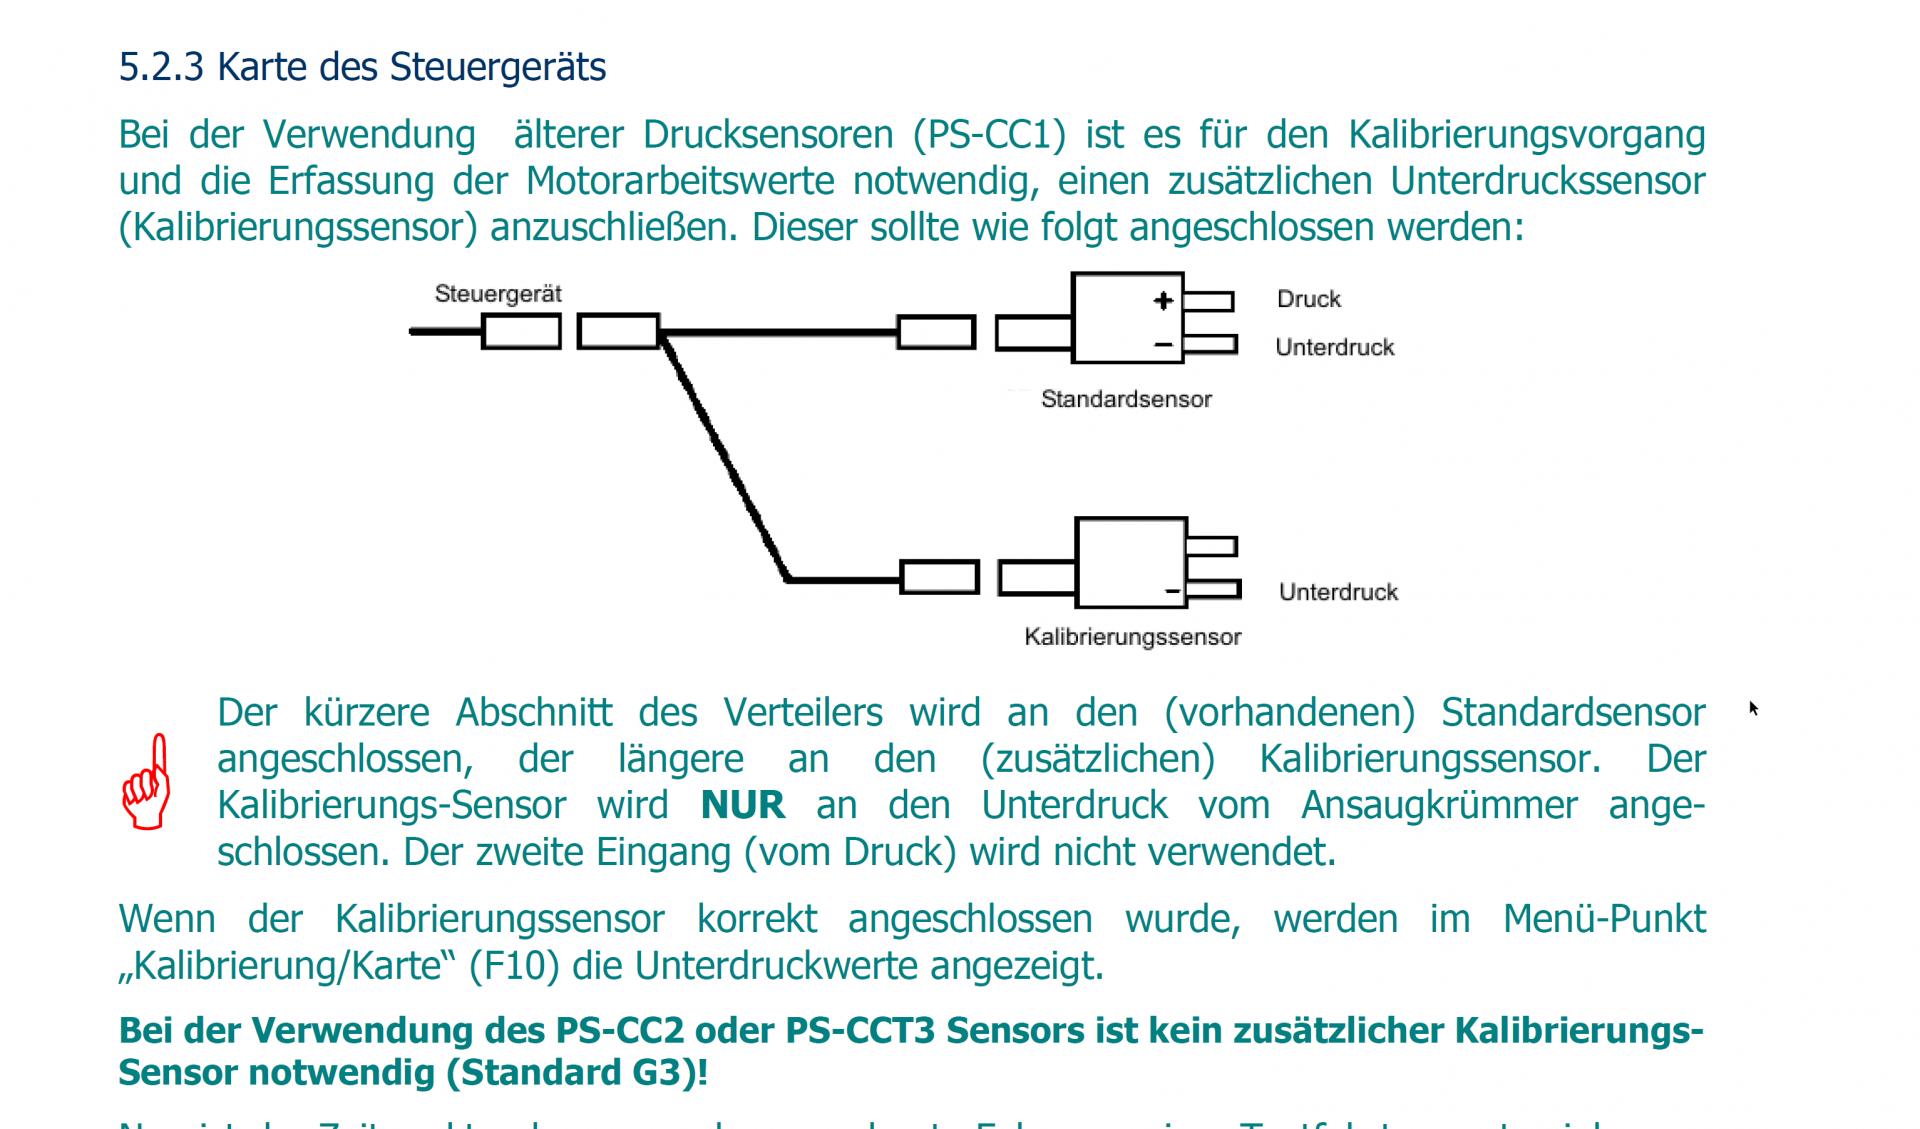 2018-09-19 00_45_27-Eifel_Anleitung_G3_PreRelease.pdf - AdobeAcrobatReaderDC.png